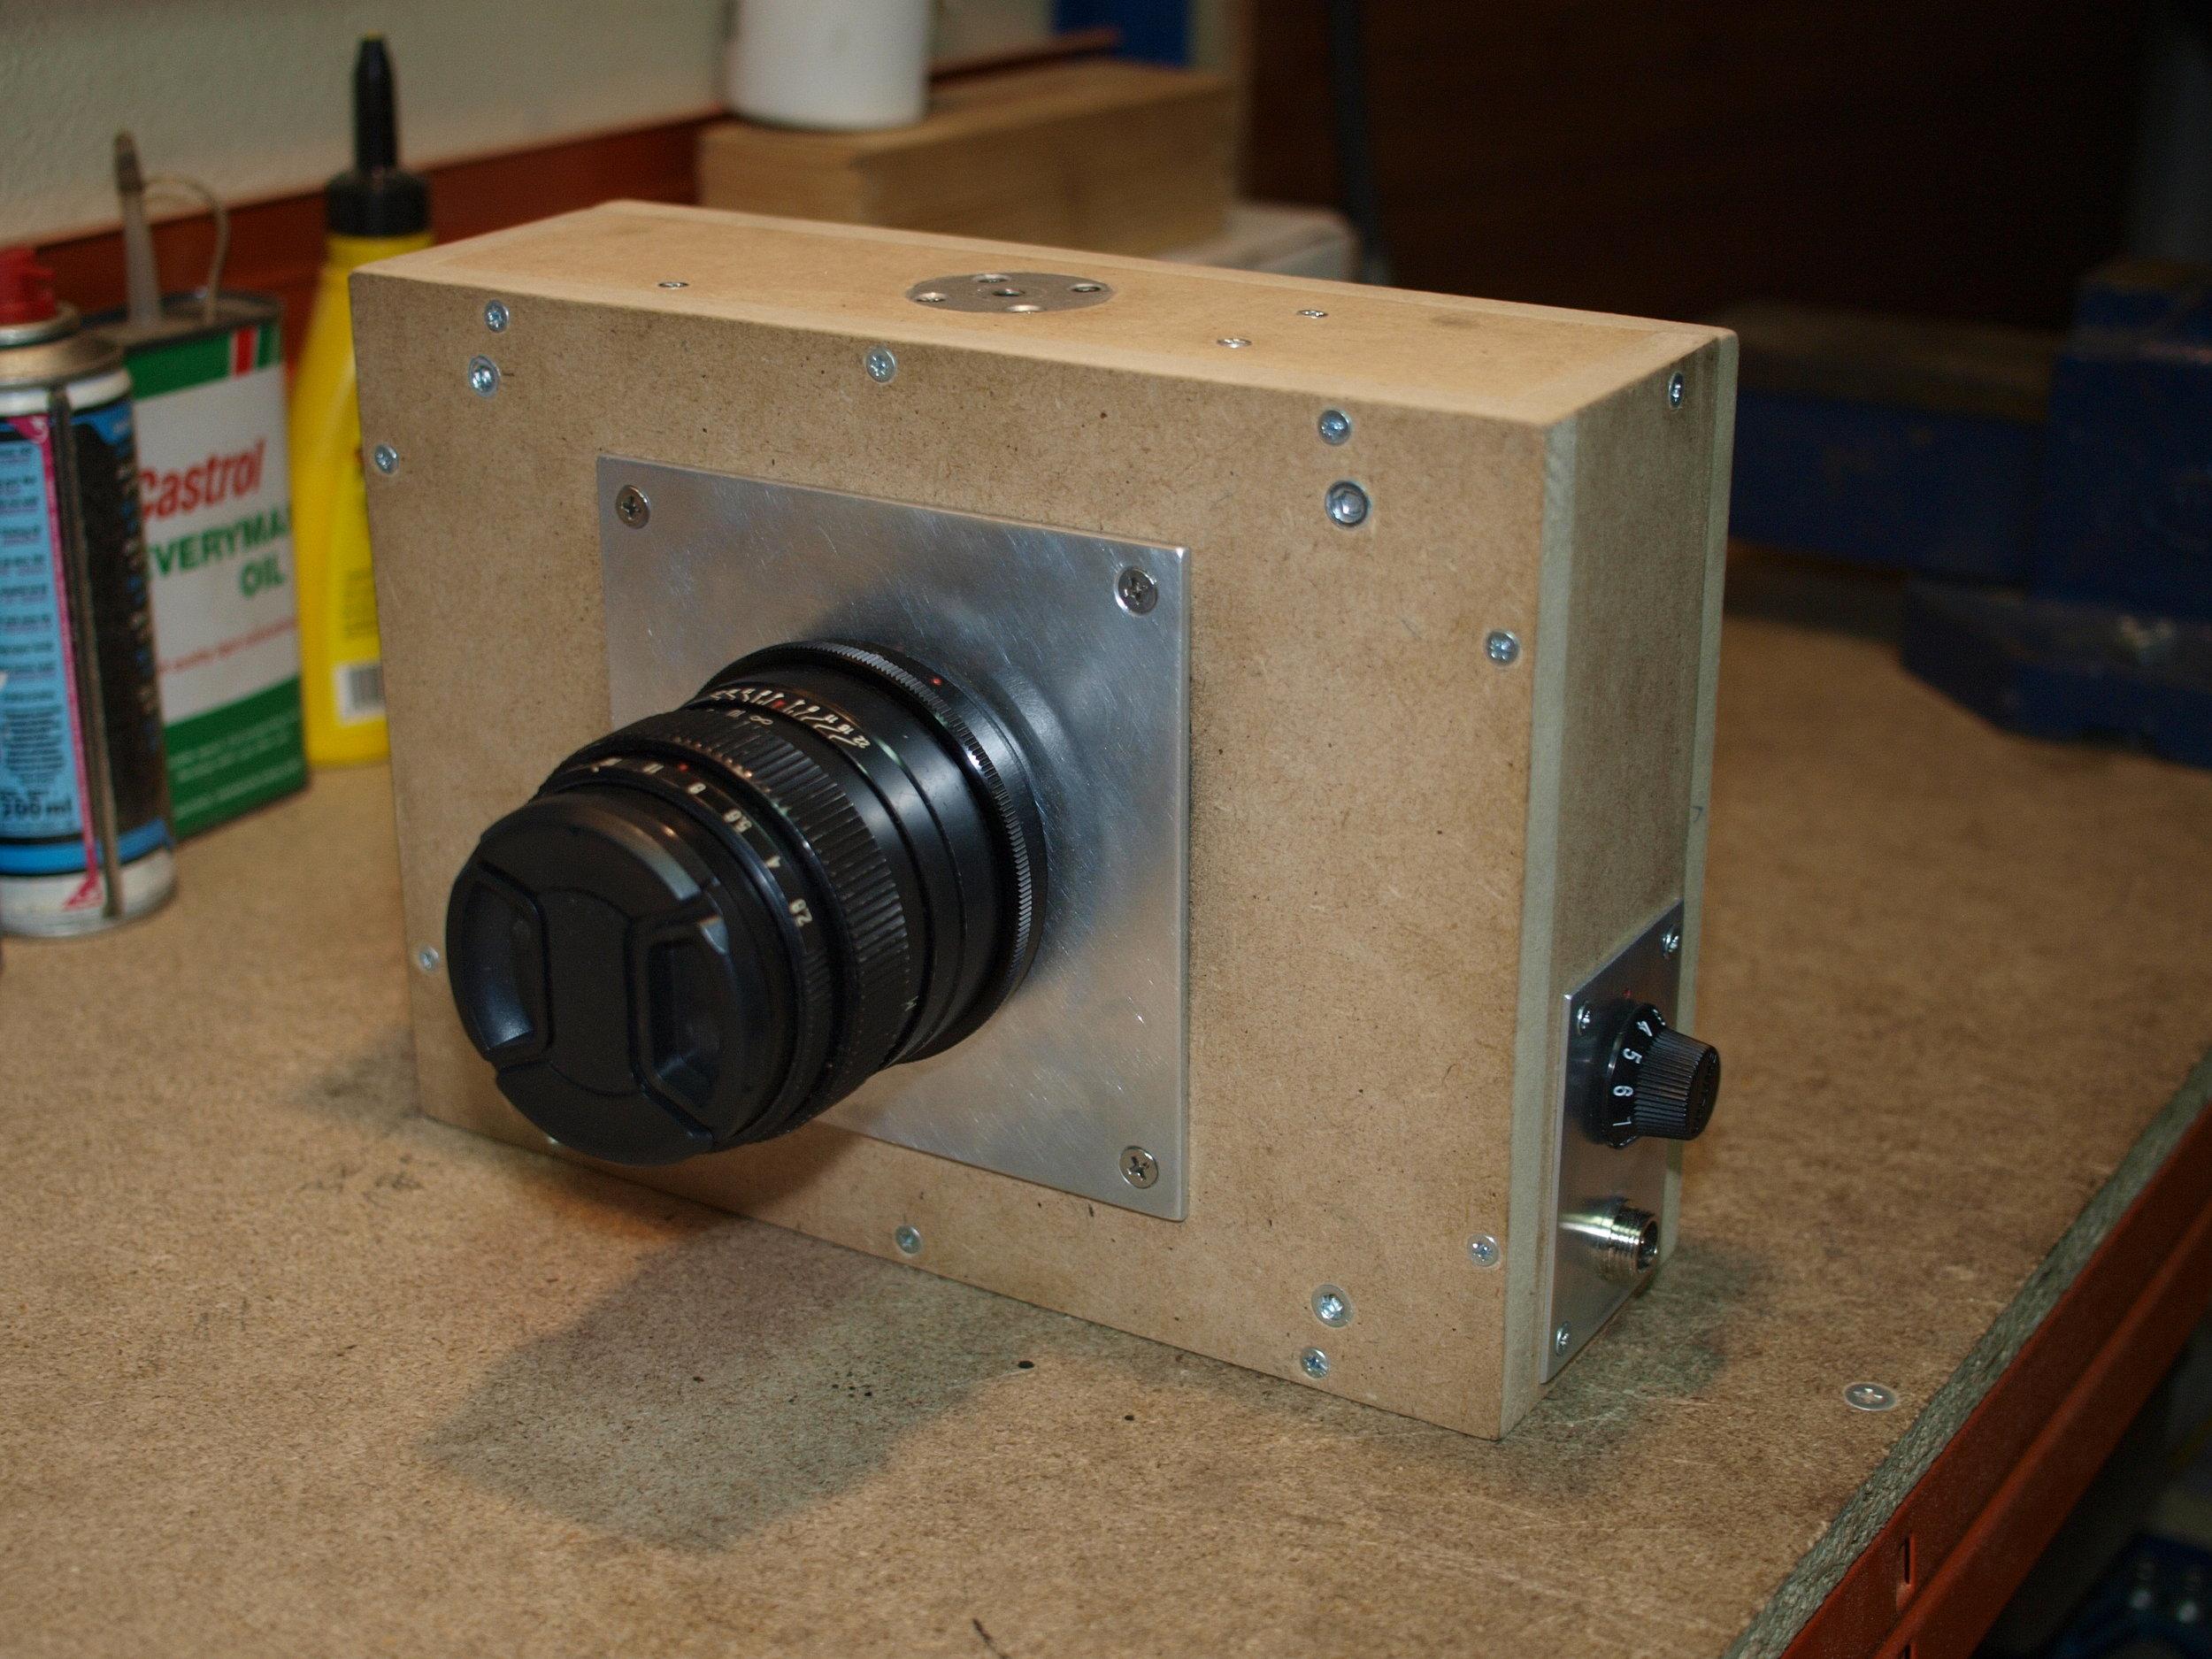 Slit-scan camera (exterior)